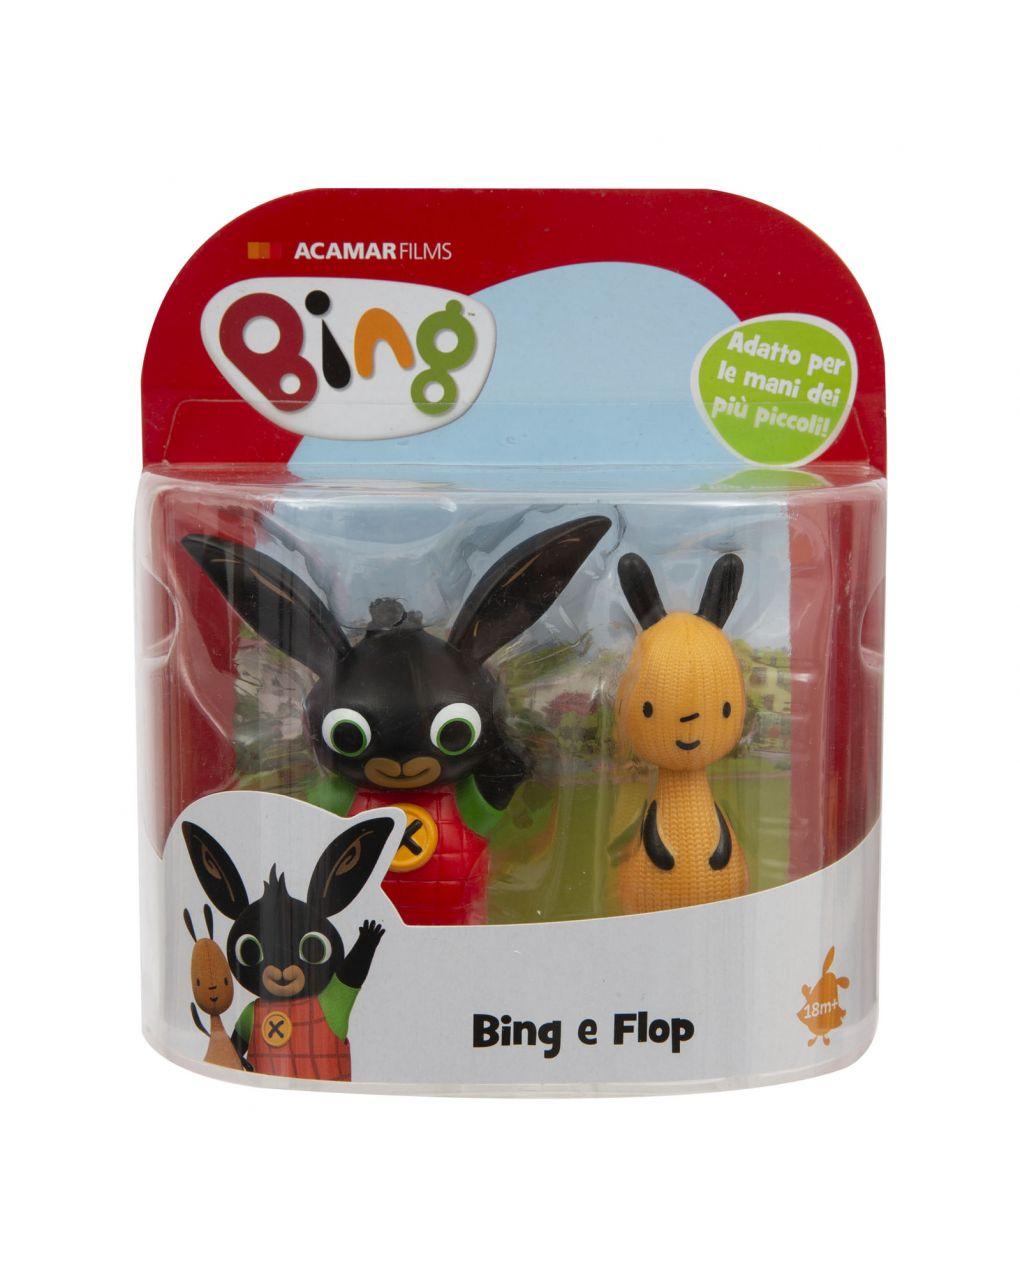 Bing coppia personaggi wave 2 - Bing